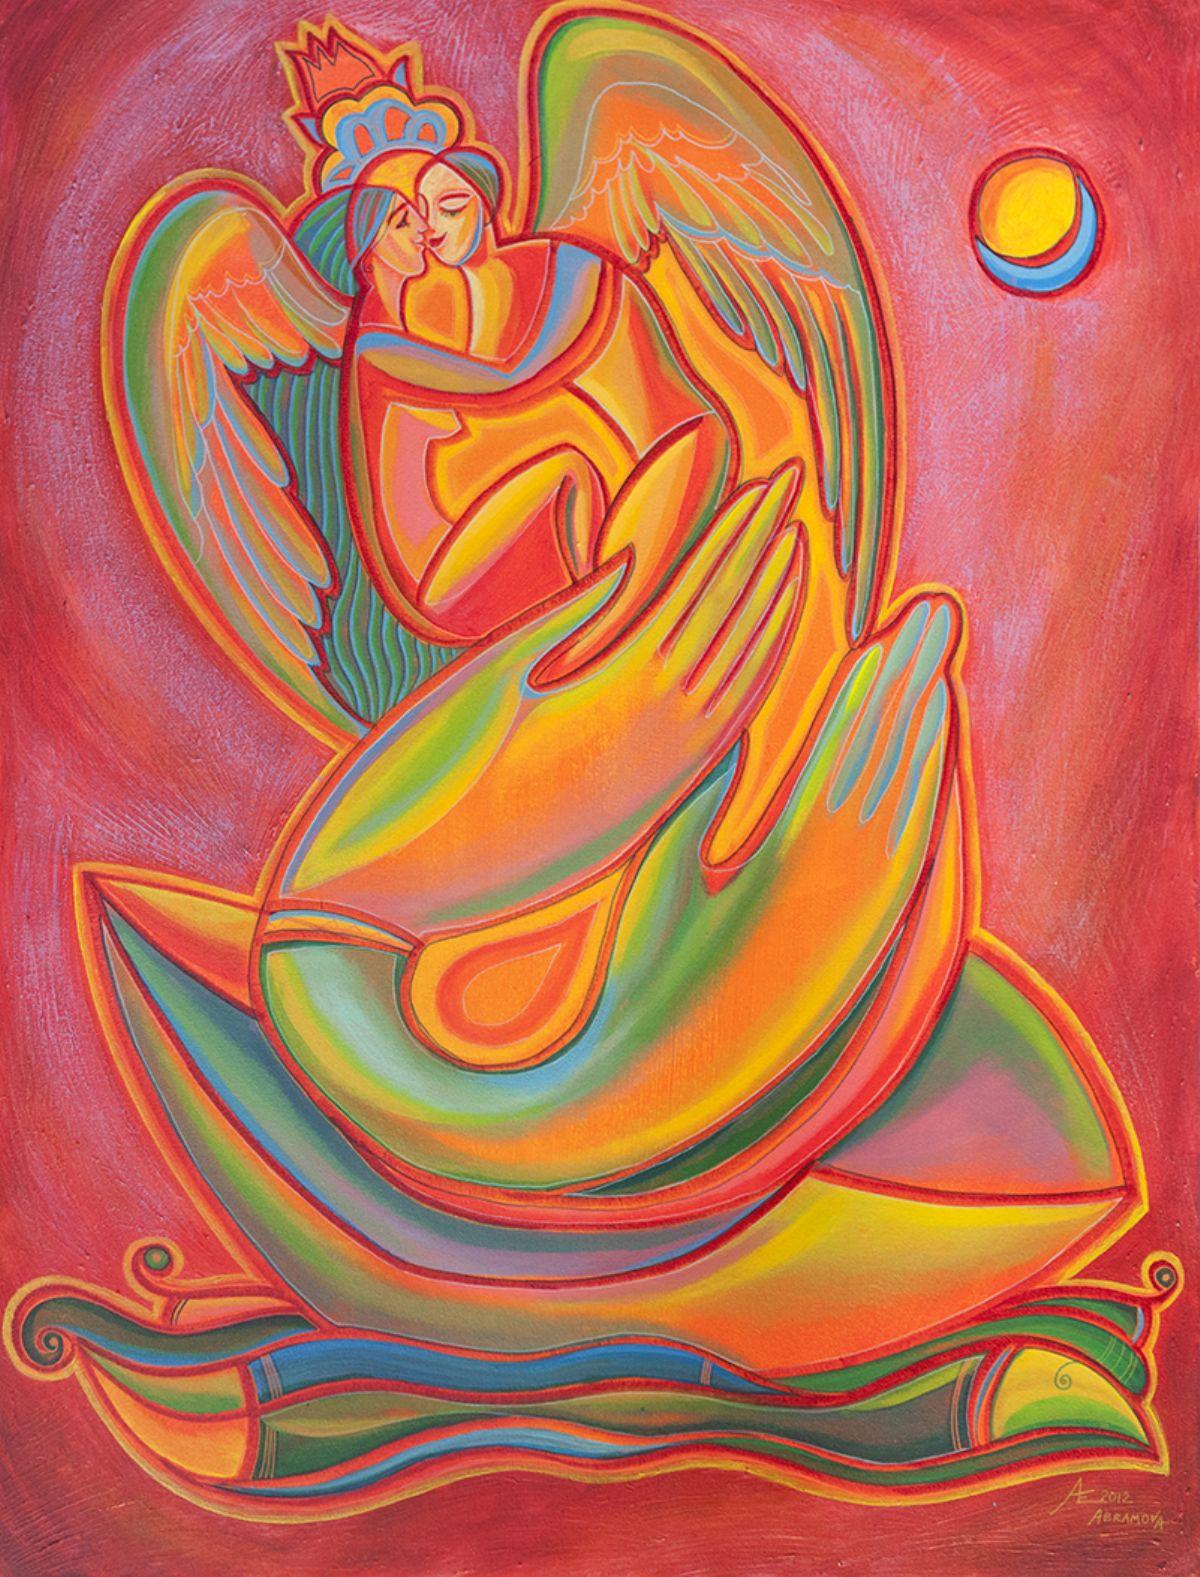 Breath of Love artwork by Ekaterina Abramova - art listed for sale on Artplode